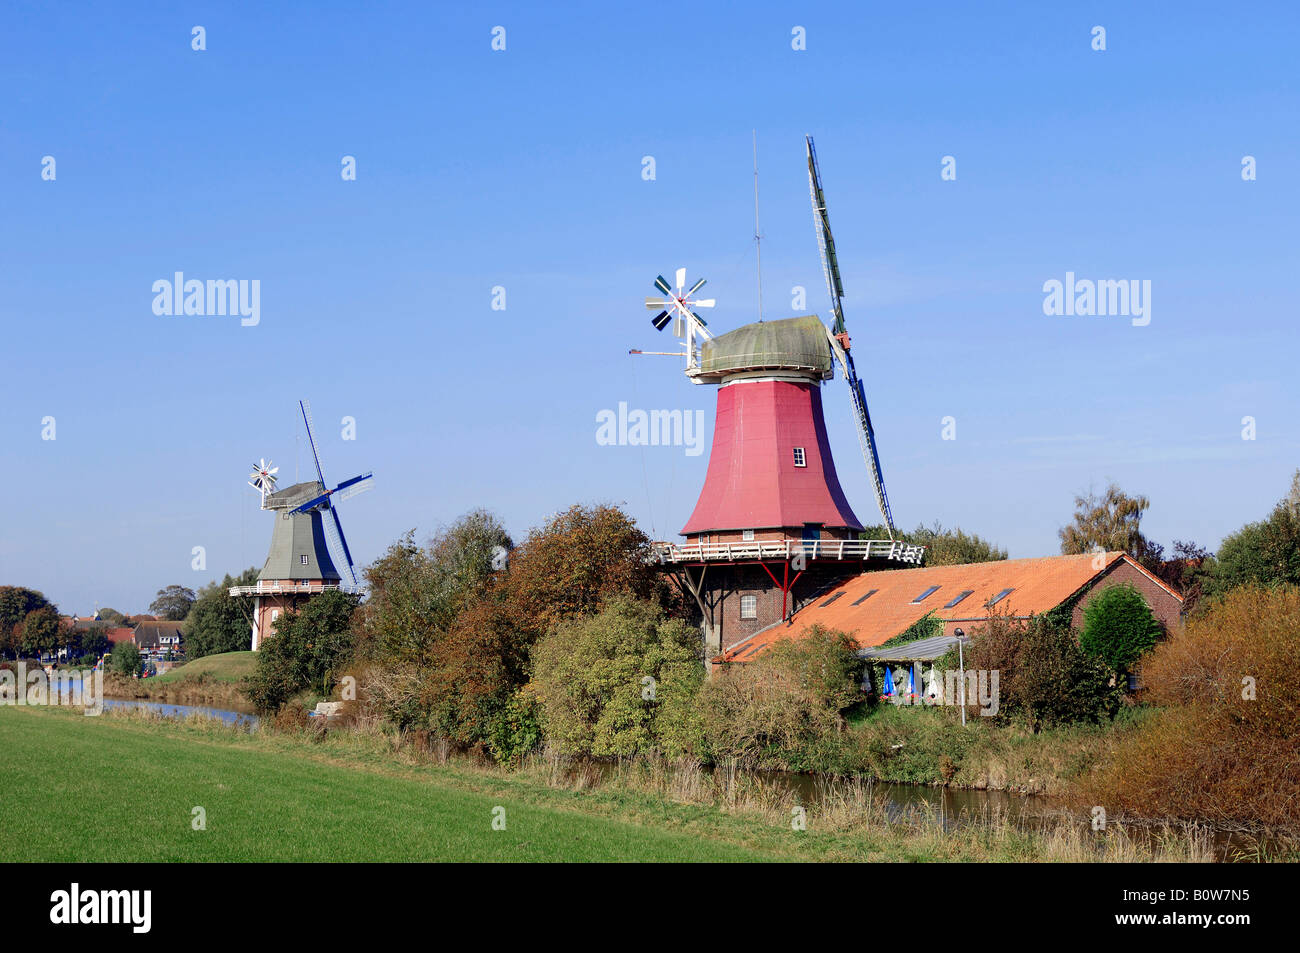 Windmills, twin windmills, Greetsiel, East Frisia, Lower Saxony, Germany, Europe - Stock Image